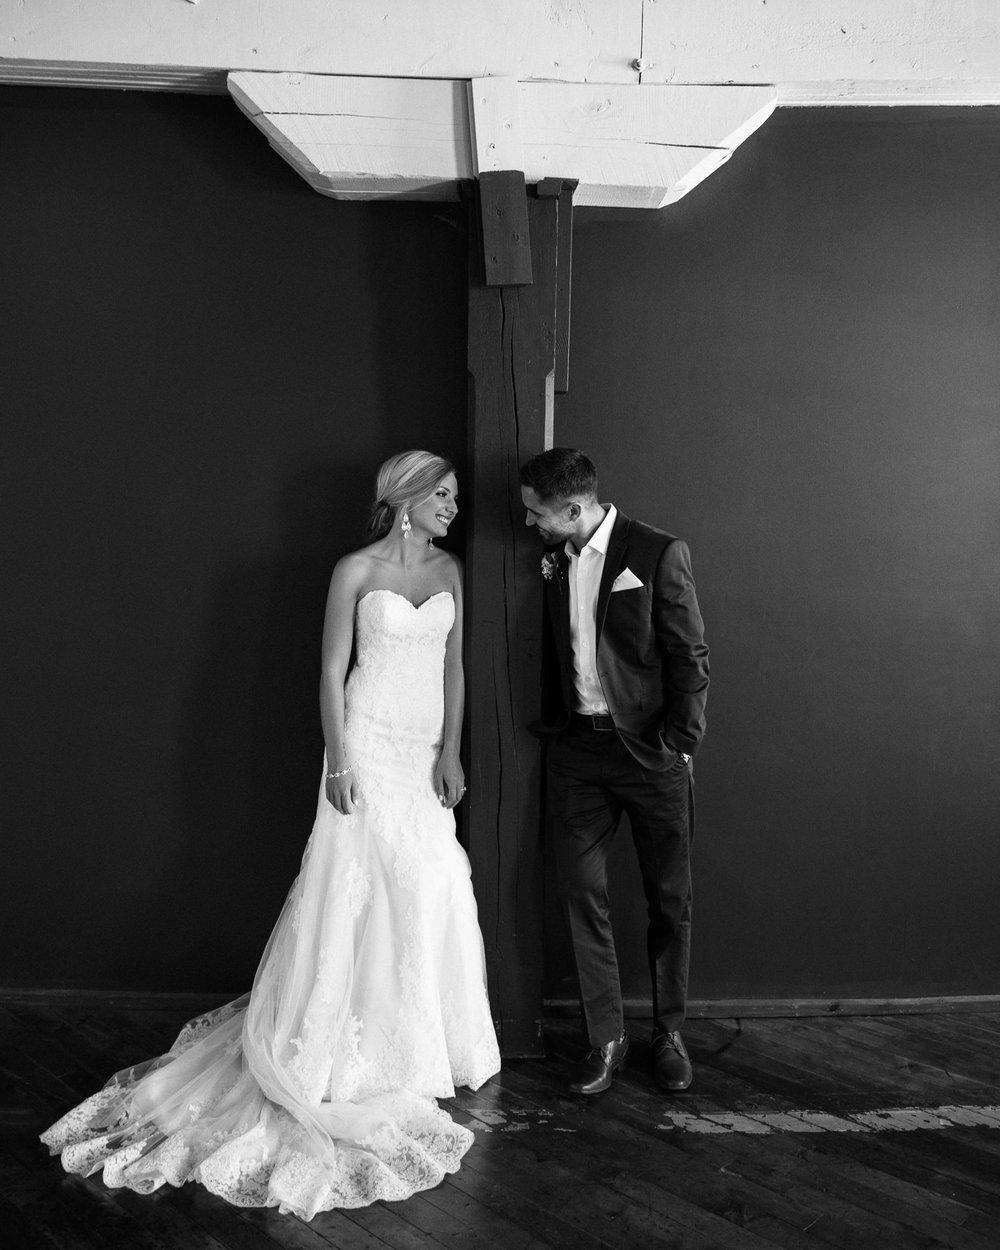 Grant+Beachy+wedding+portrait+fitness+marketing+photographer+goshen+elkhart+south+bend+chicago-027.jpg